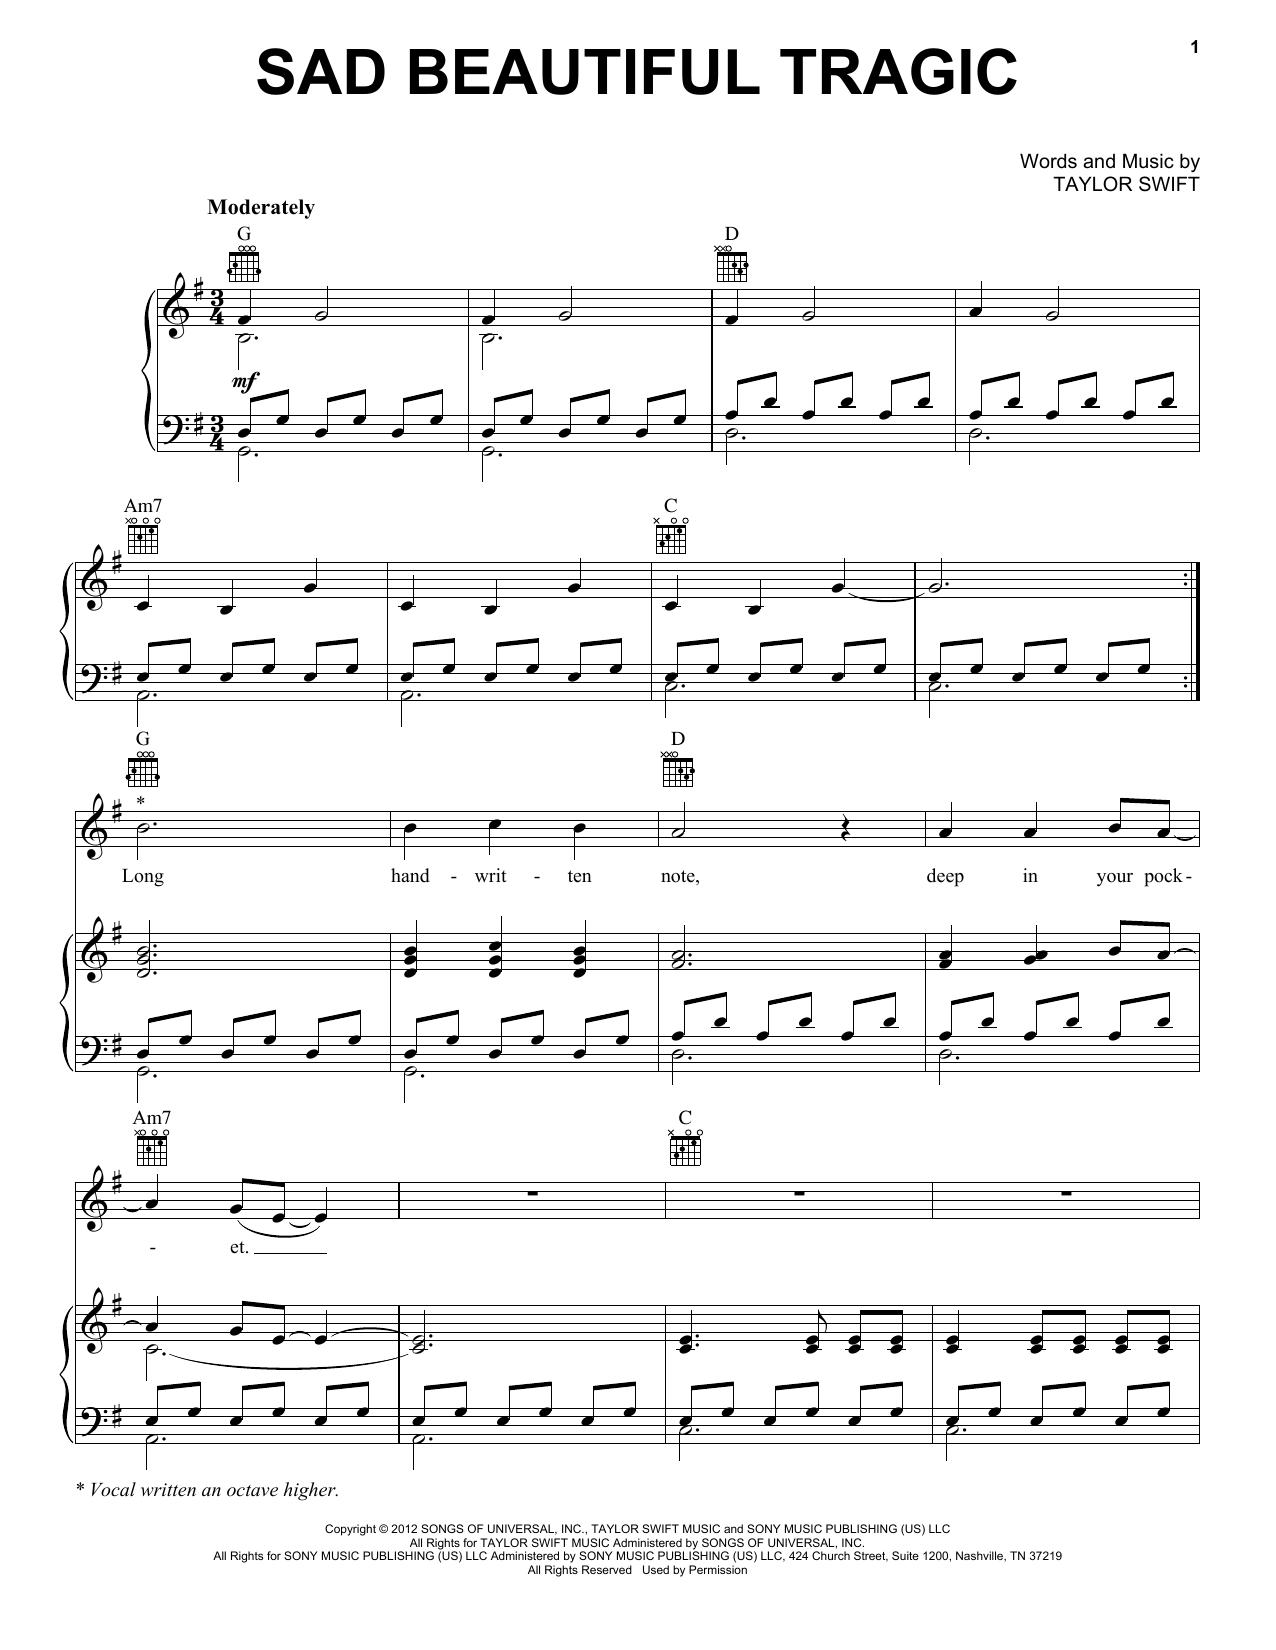 Taylor Swift - Red Sheet Music - Hal Leonard - Prima Music